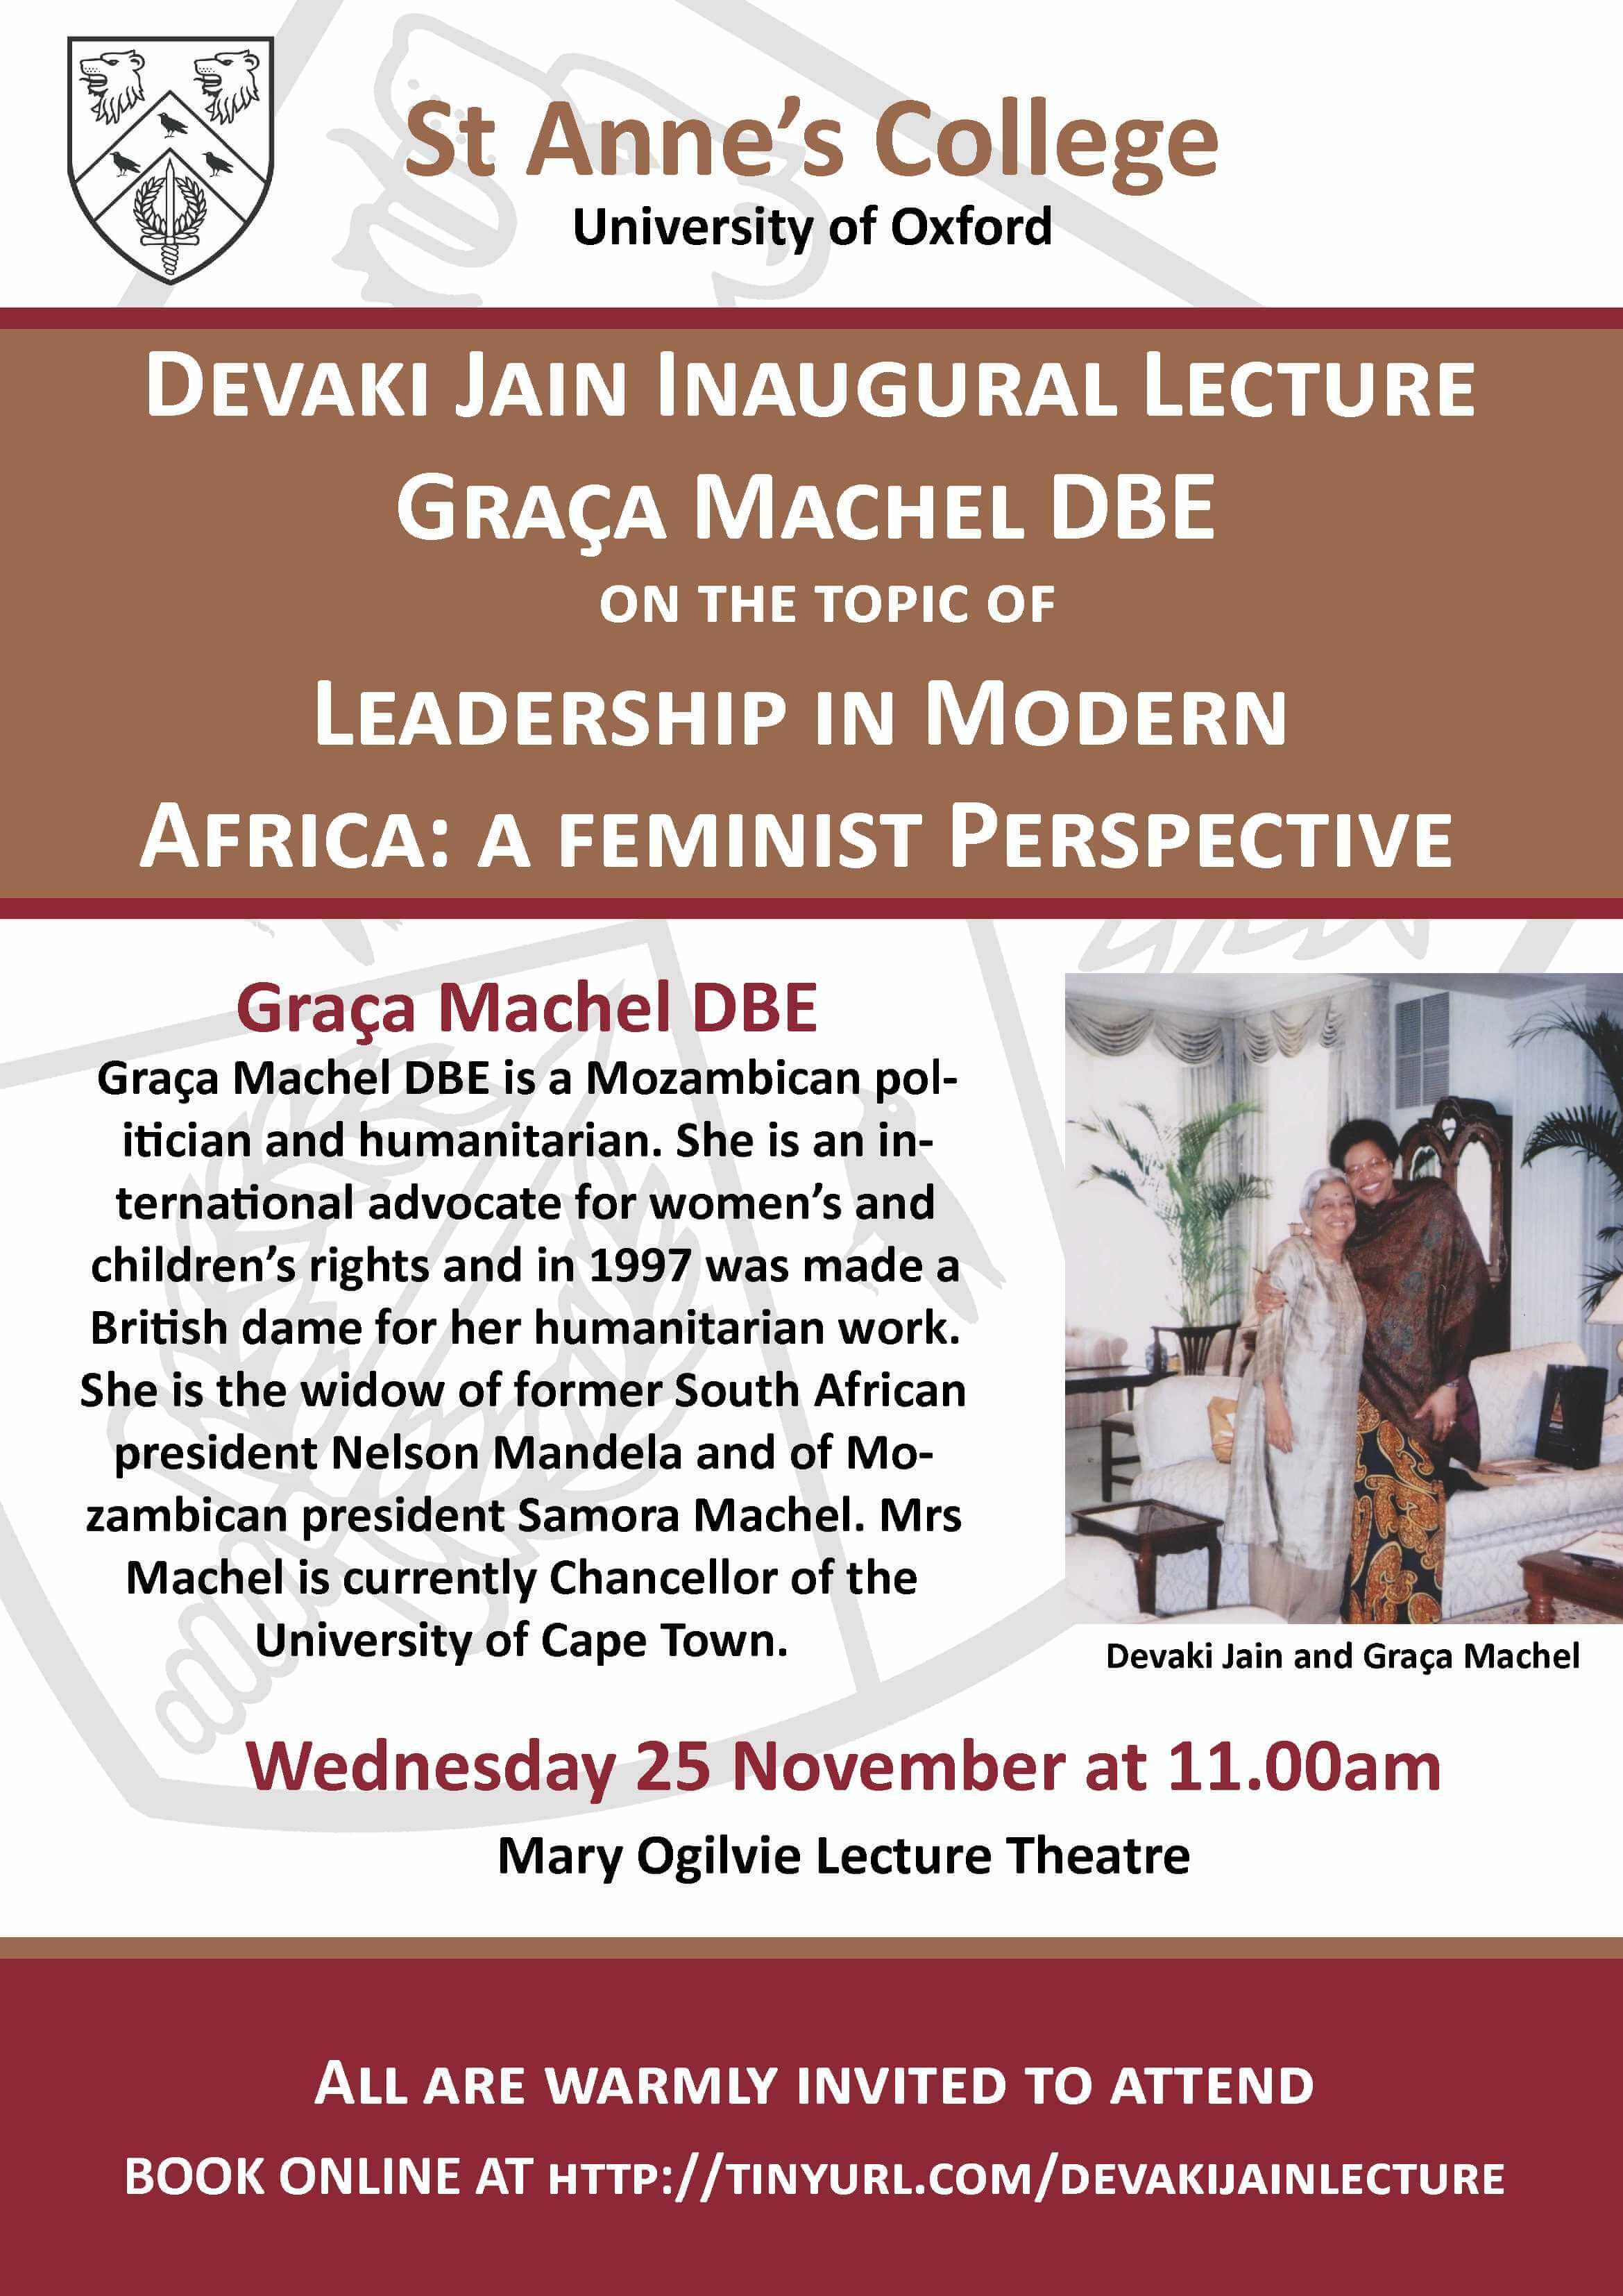 Devaki Jain Inaugural Lecture-Leadership in Modern Africa: A Feminist Perspective by Graca Machel DBE